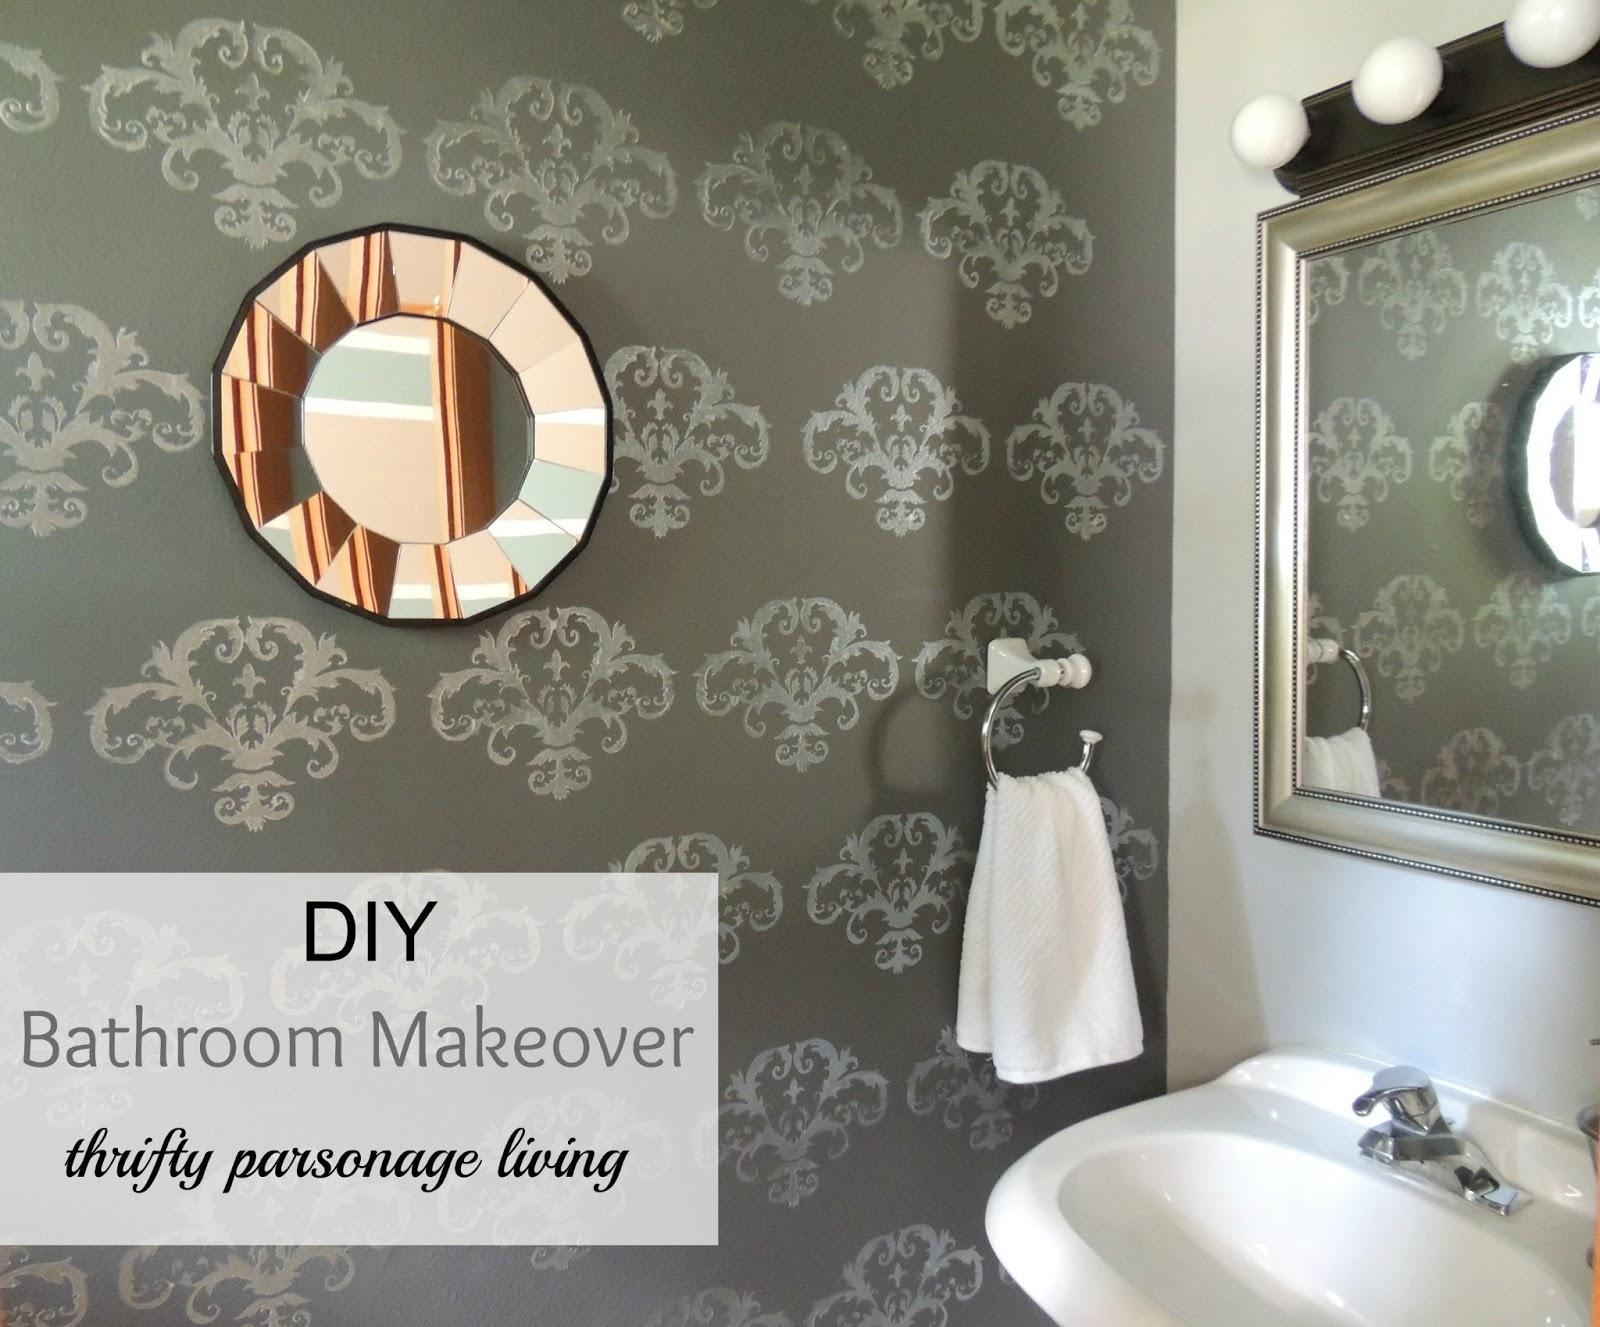 Thrifty Parsonage Living: DIY BATHROOM MAKEOVER